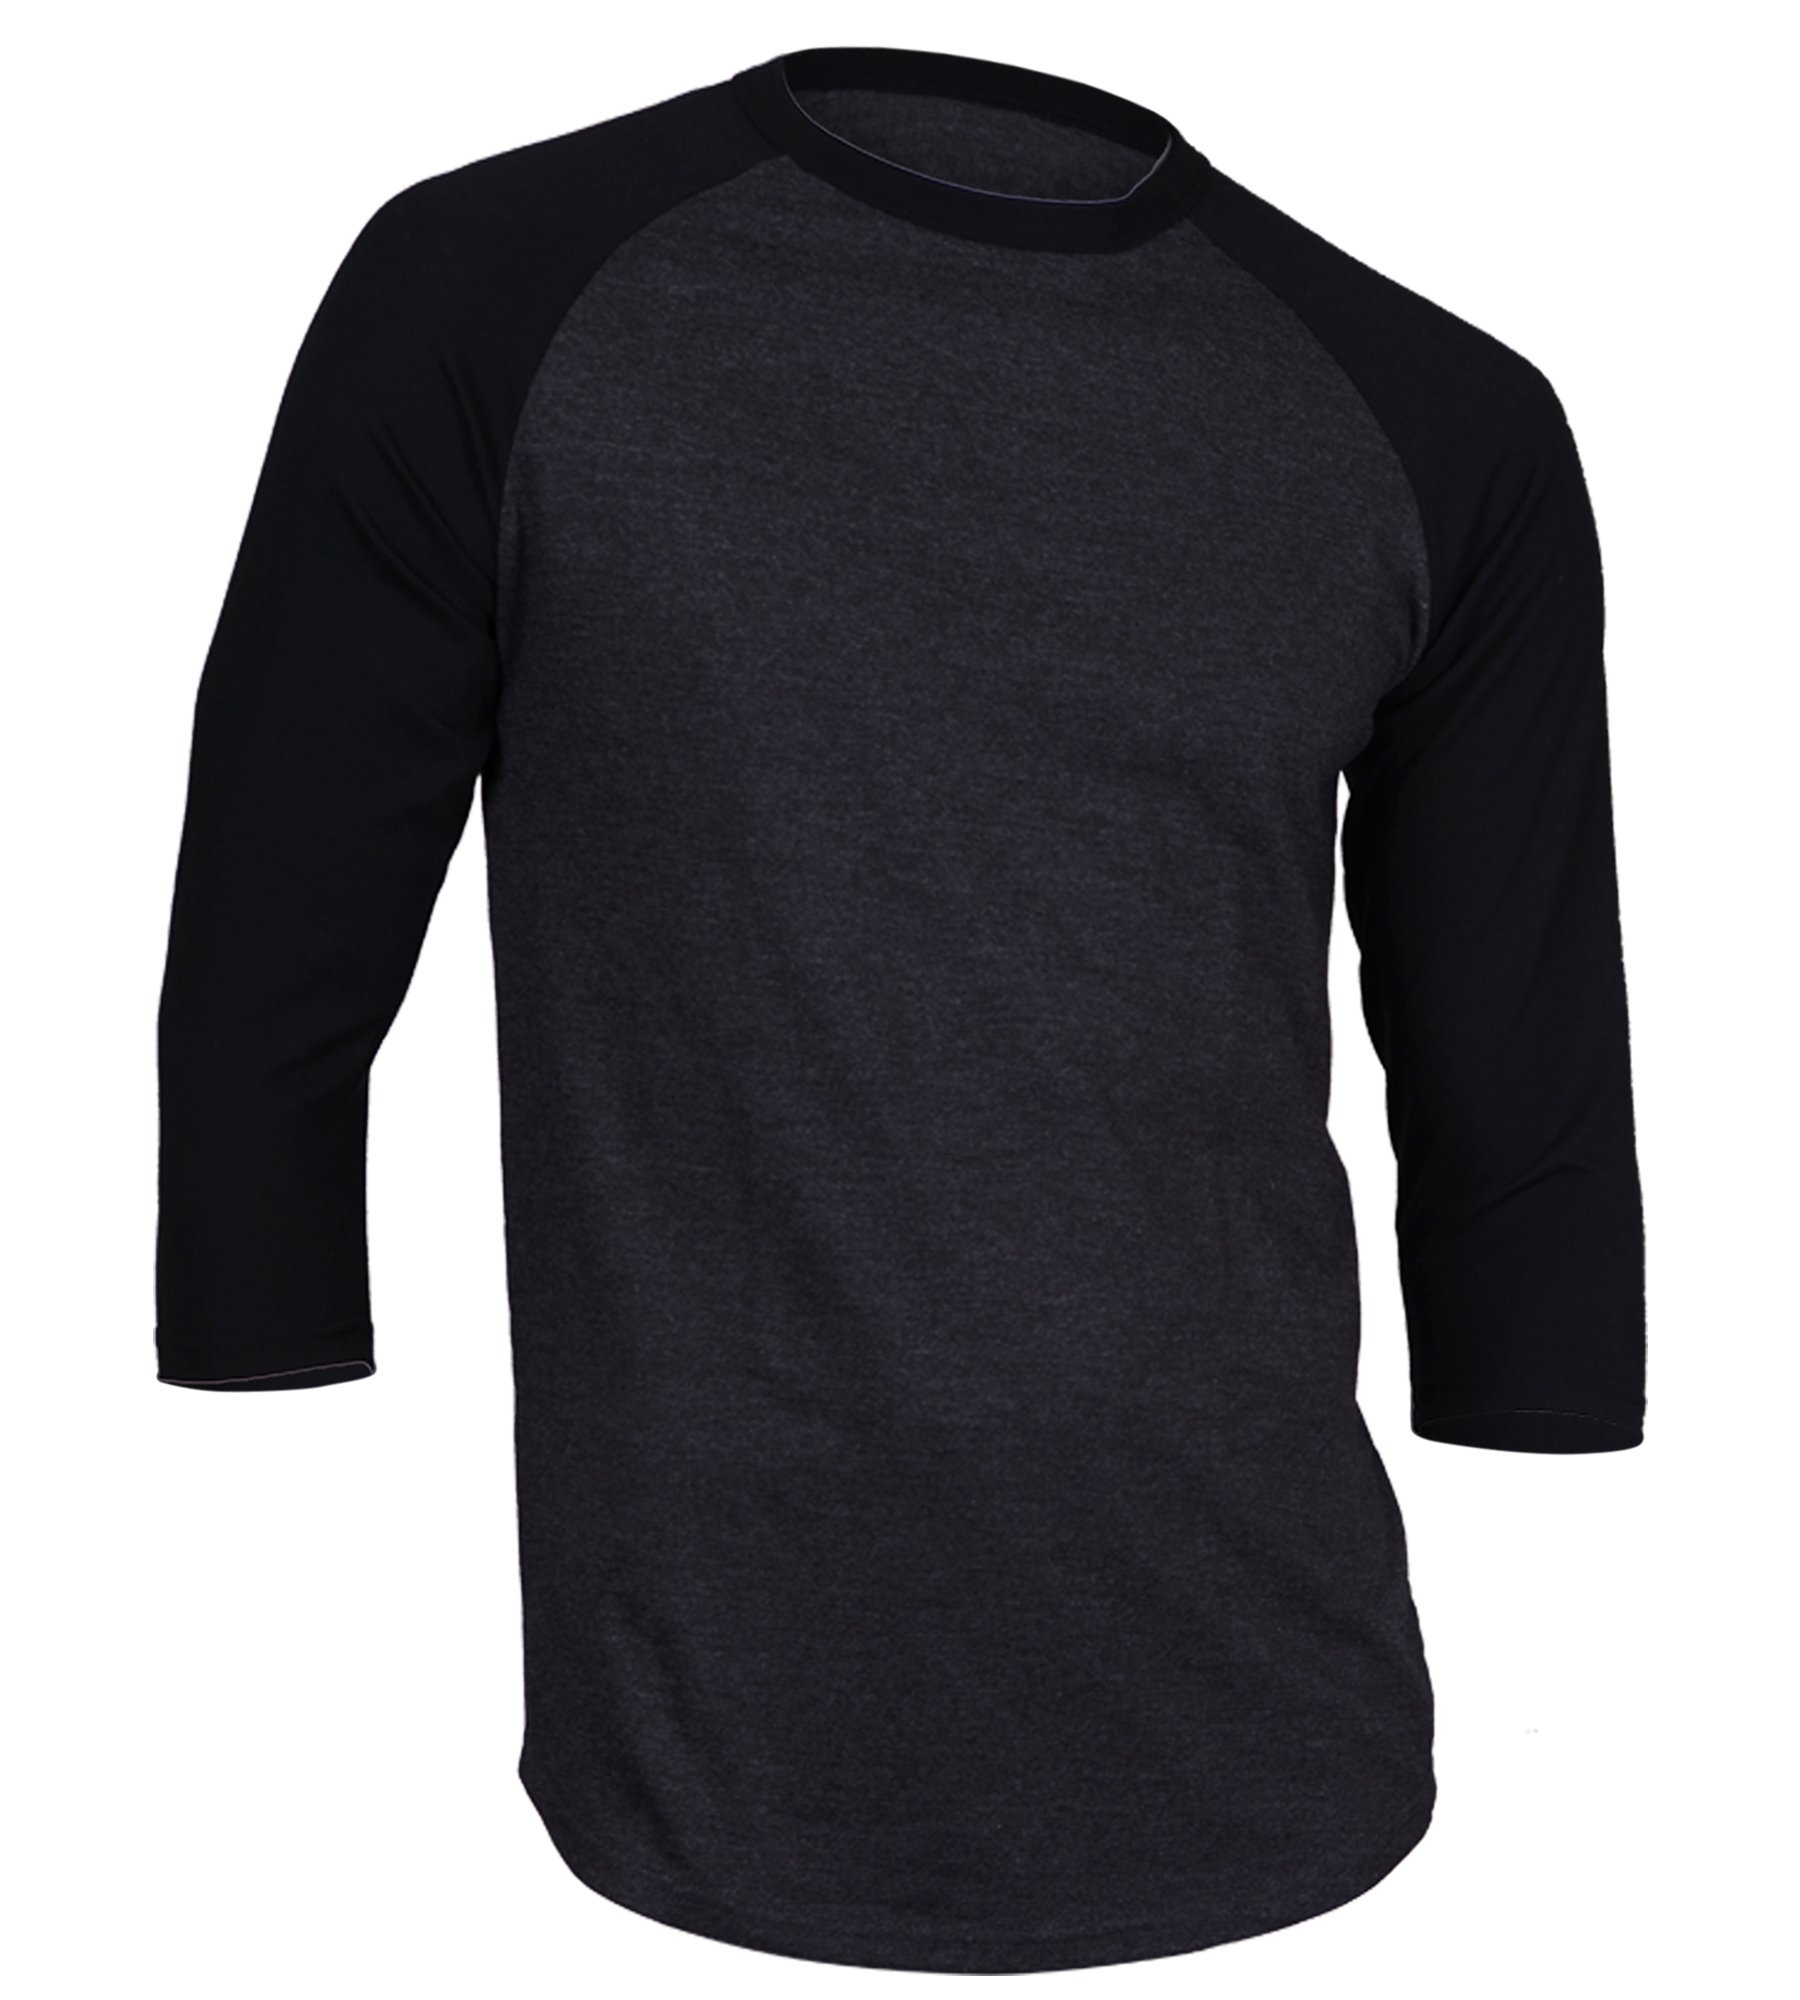 Dream USA Men's Casual 3/4 Sleeve Baseball Tshirt Raglan Jersey Shirt C Gray/Black Large